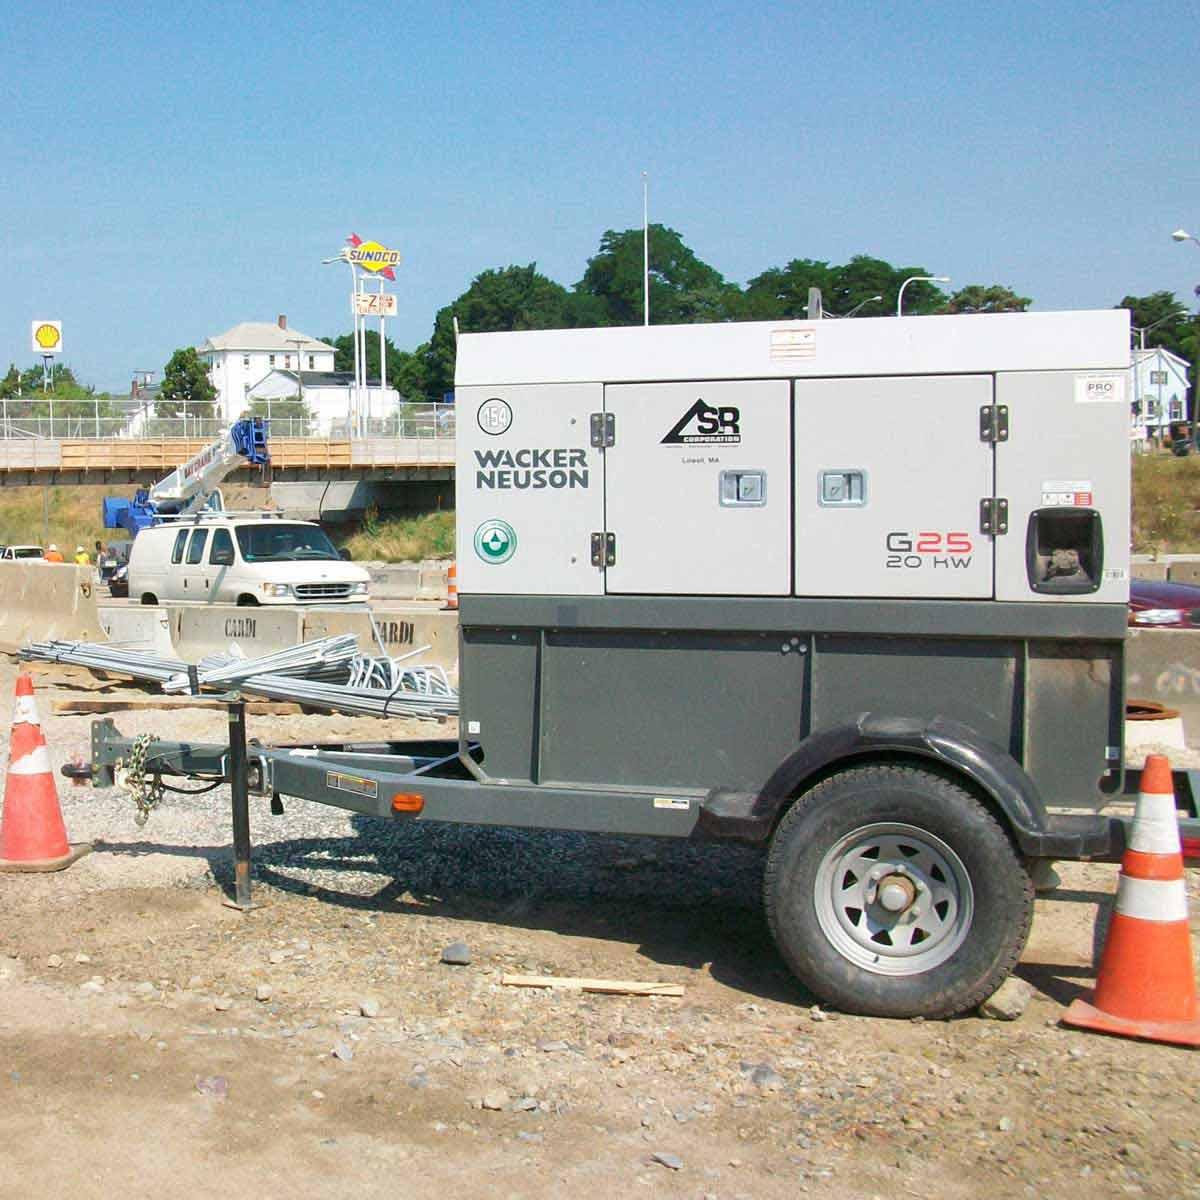 Wacker Neuson G25 20 kW Job Site Generator